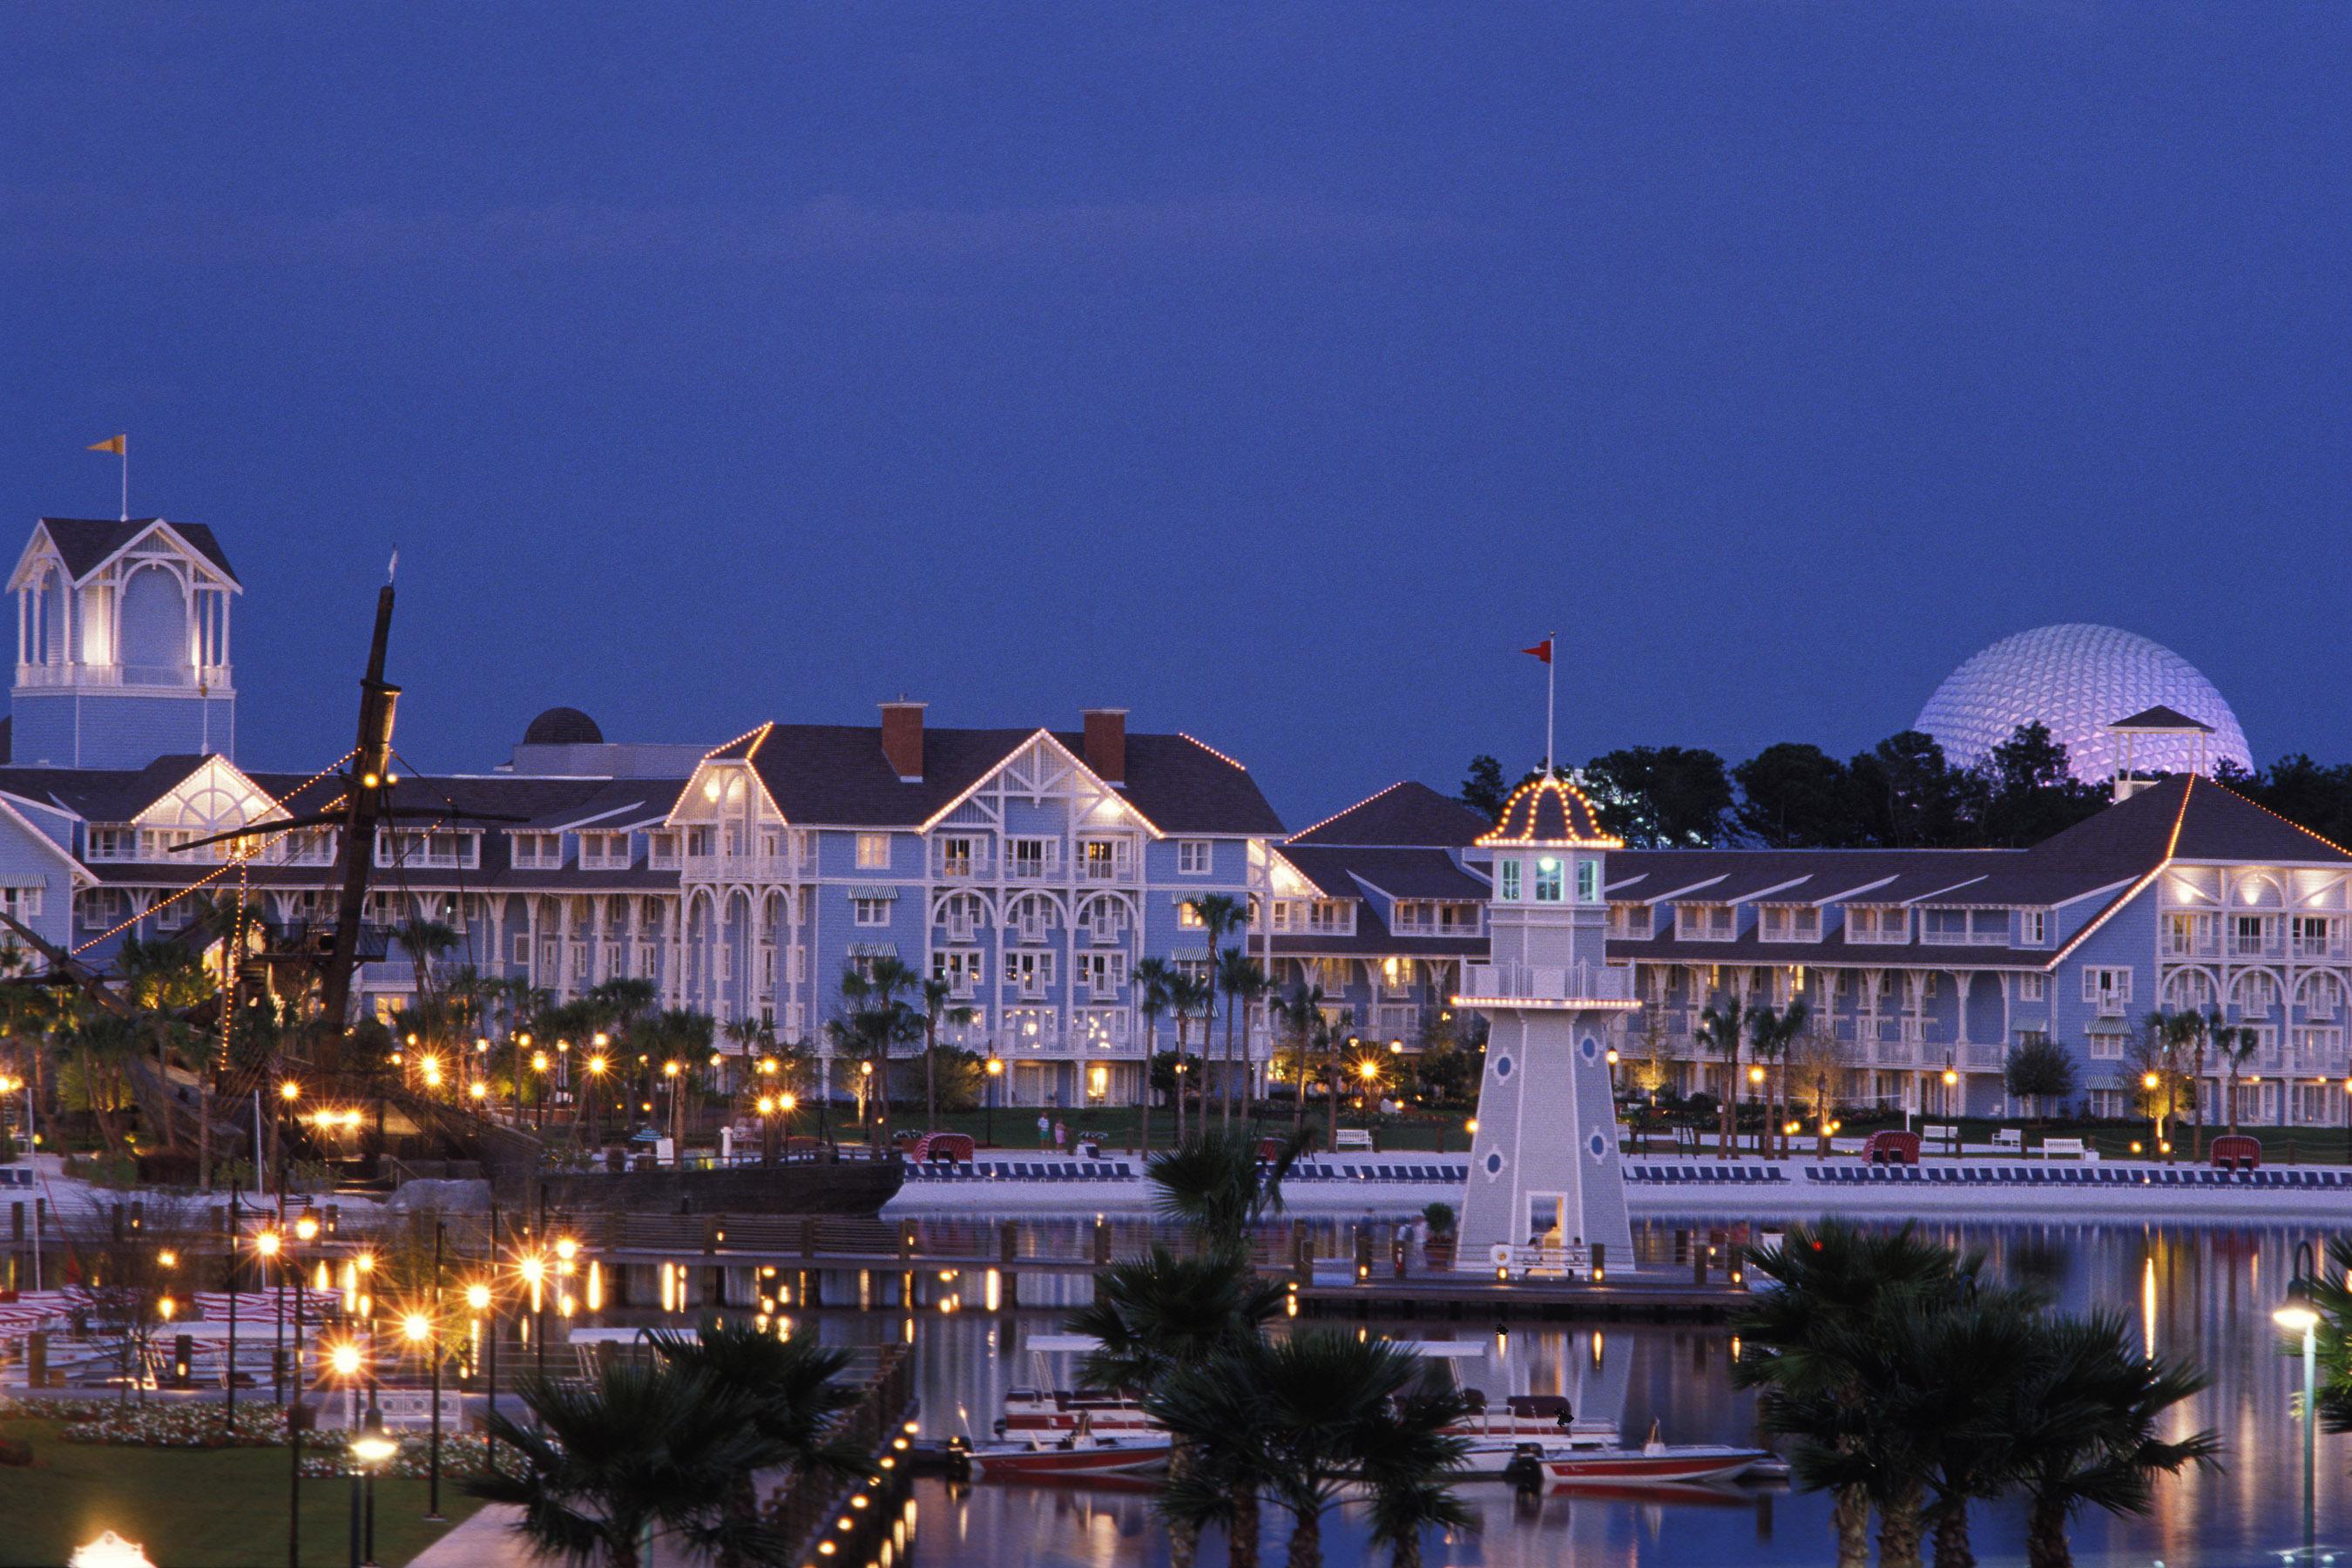 Disney S Yacht Club Resort And Beach Bring Turn Of The Century New England To Vacation Kingdom Walt World News